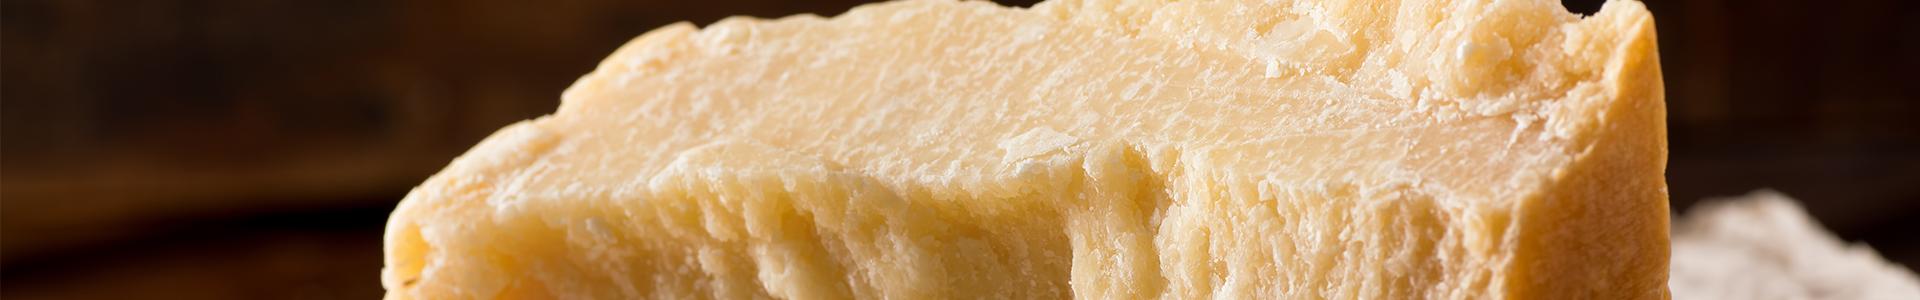 Parmigiano Reggiano extra long ageing